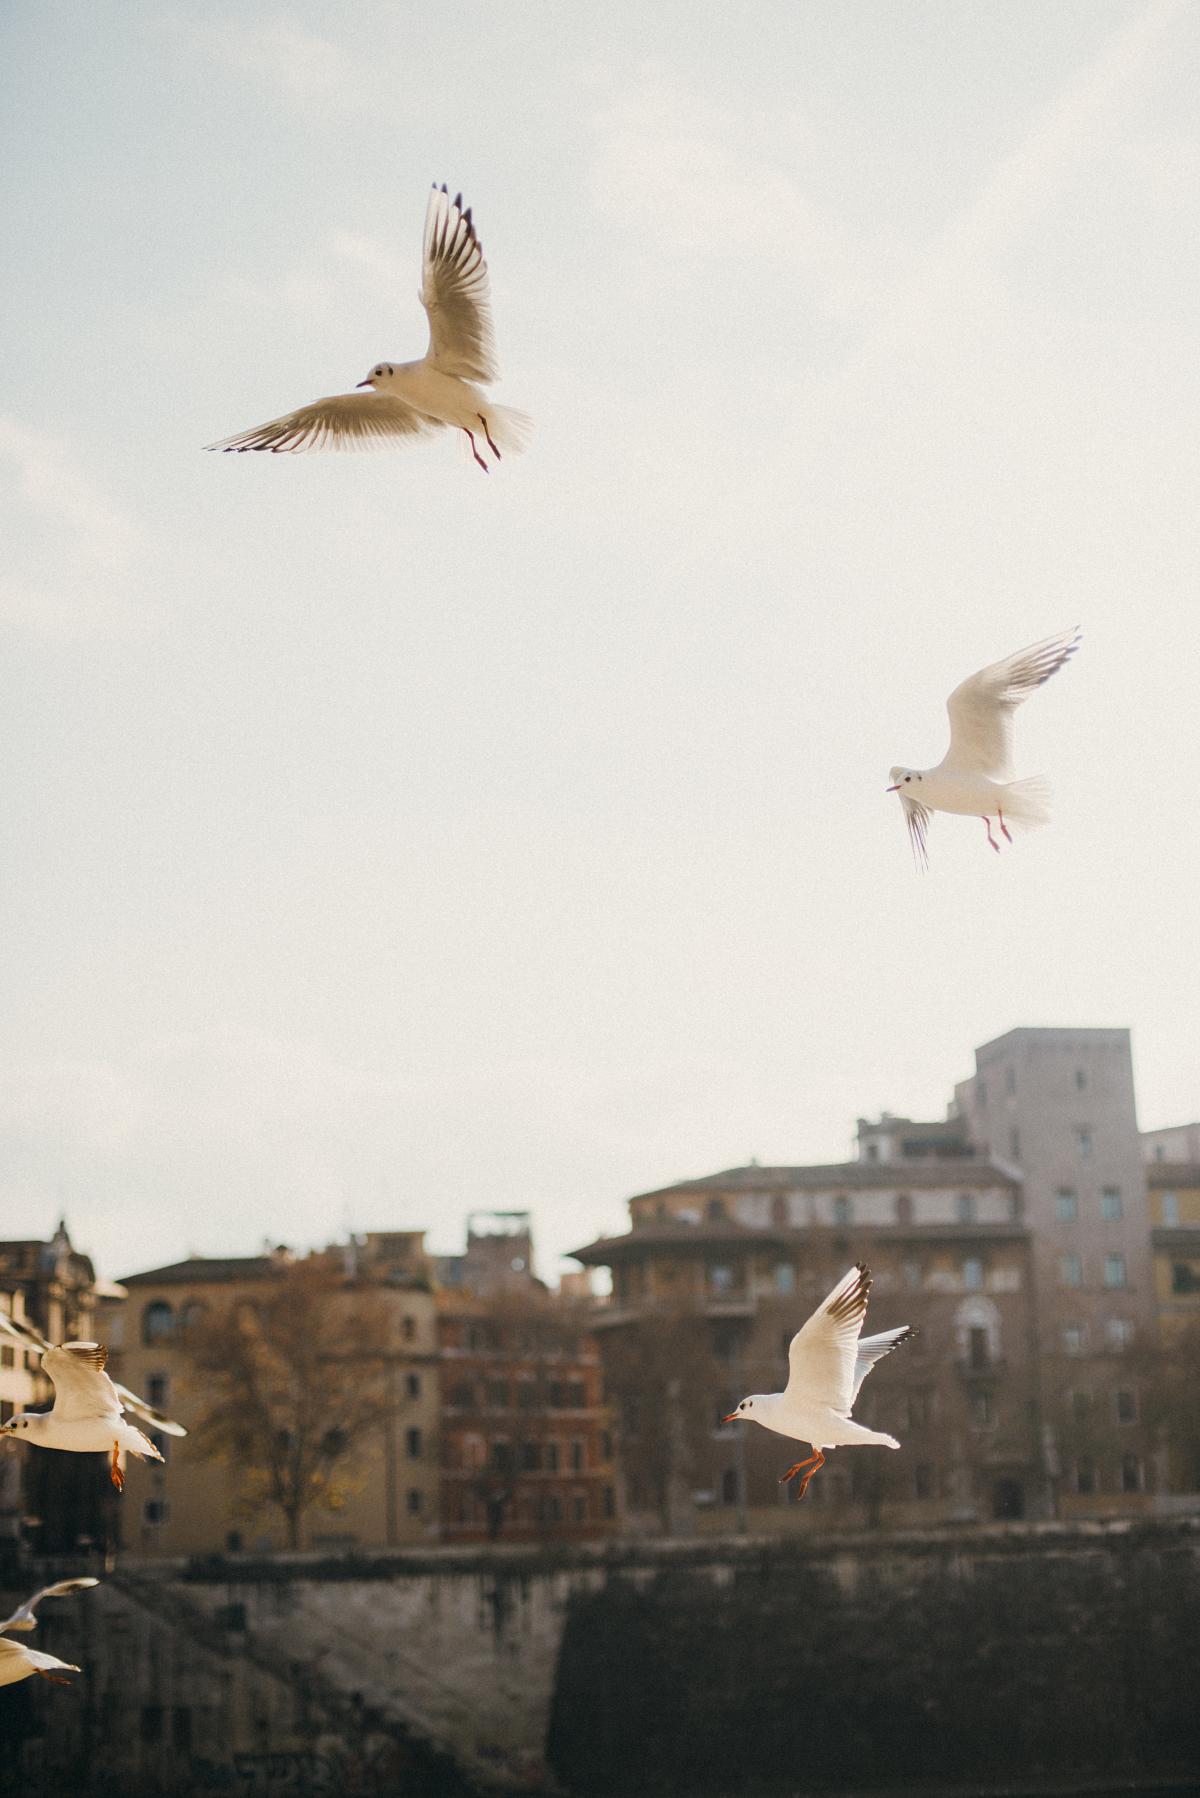 Культурные столицы Италии Культурные столицы Италии ines perkovic a simple hello rome birds sea gulls